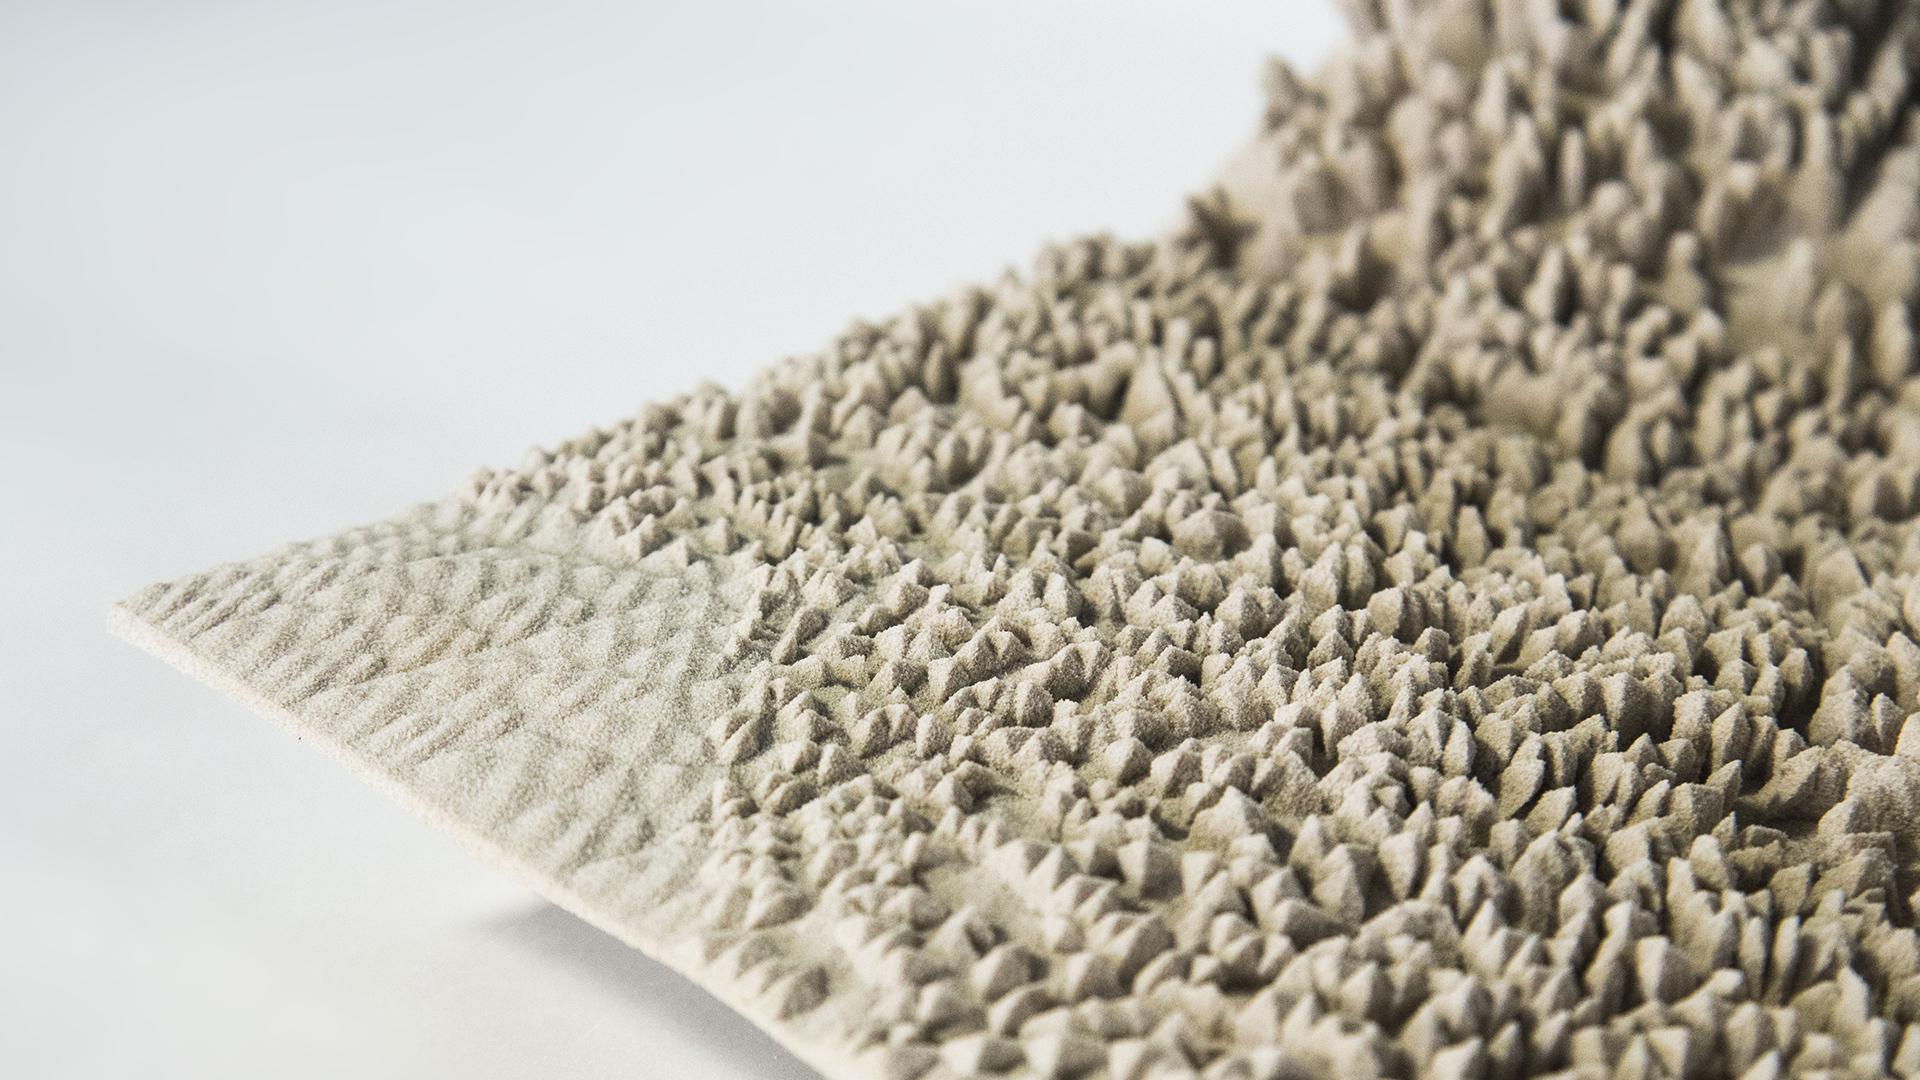 3D printed acoustic translucent ceiling panel (Alexander Enz, Matteo Lomaglio)